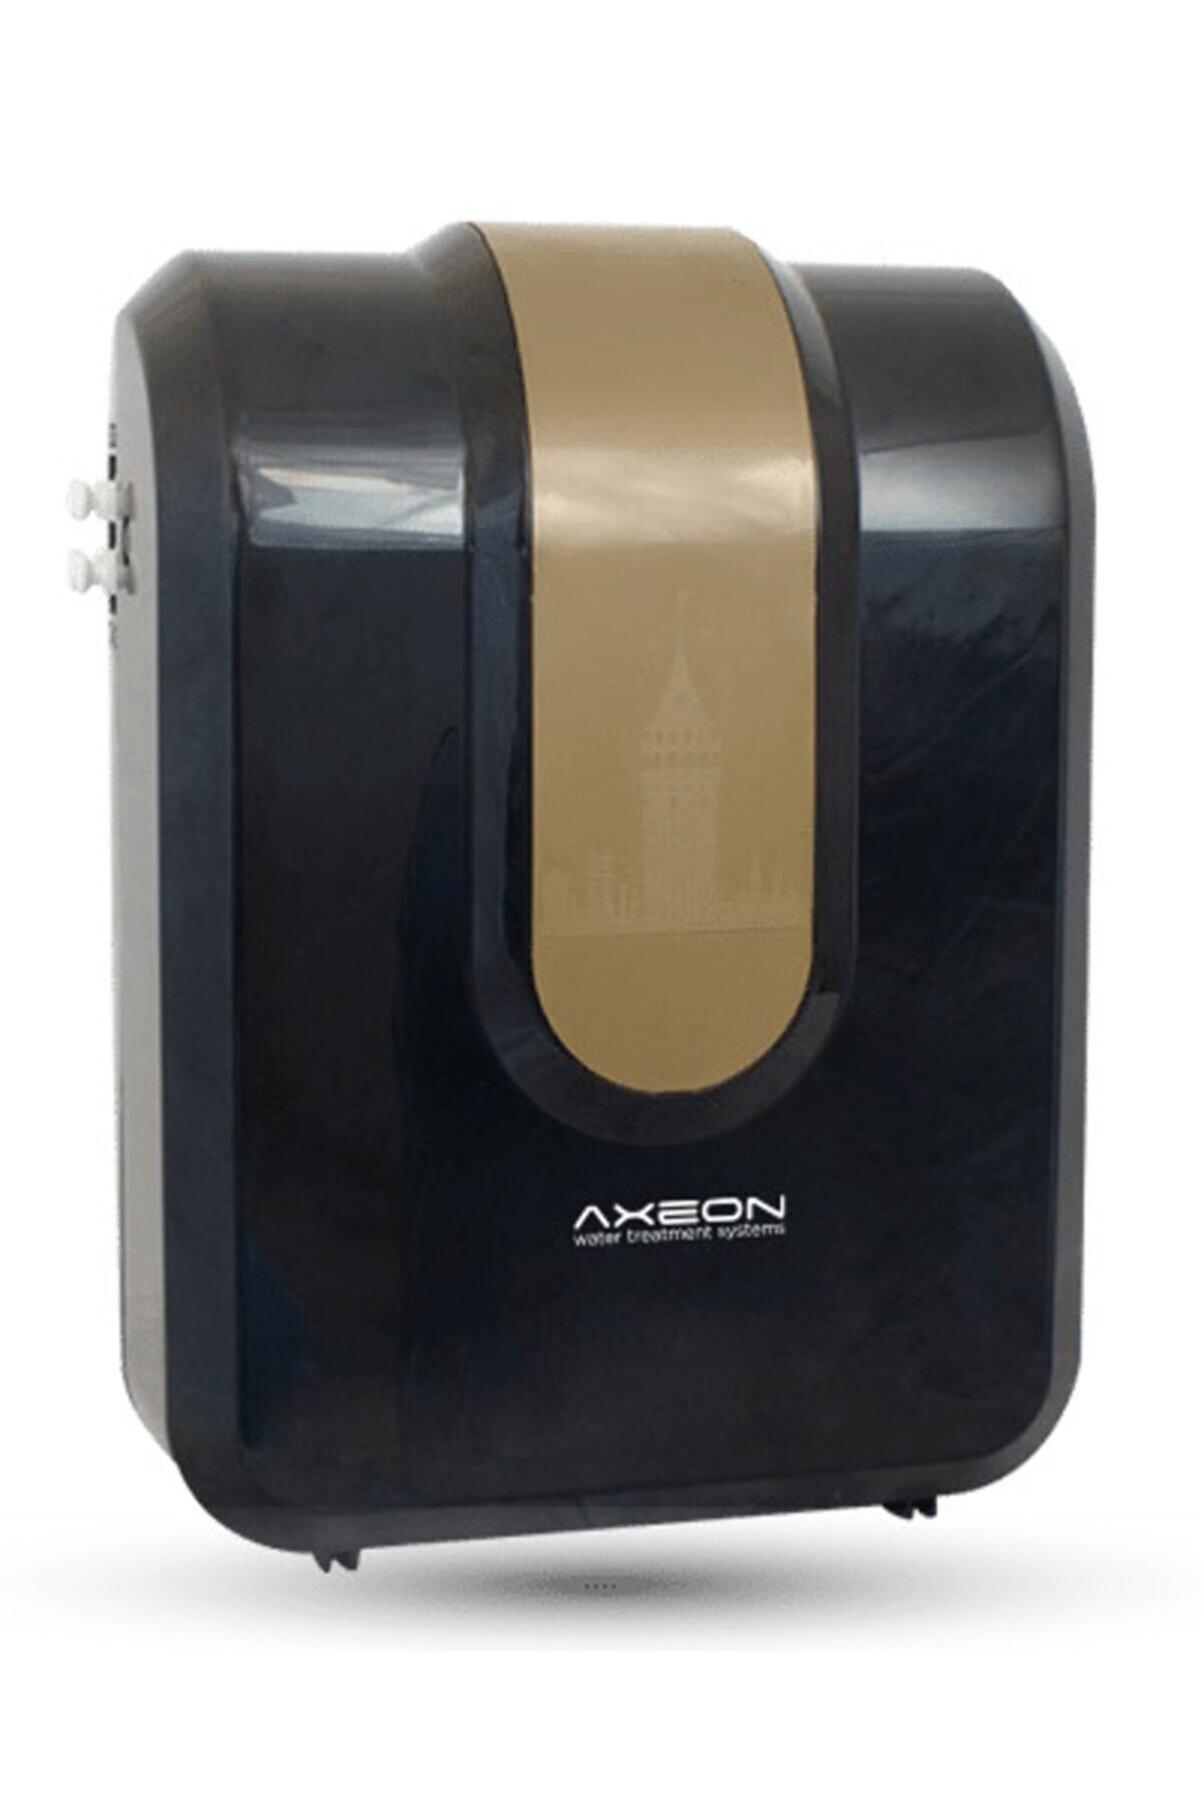 Axeon Gold Tezgah Altı Içme Suyu Arıtma Cihazı